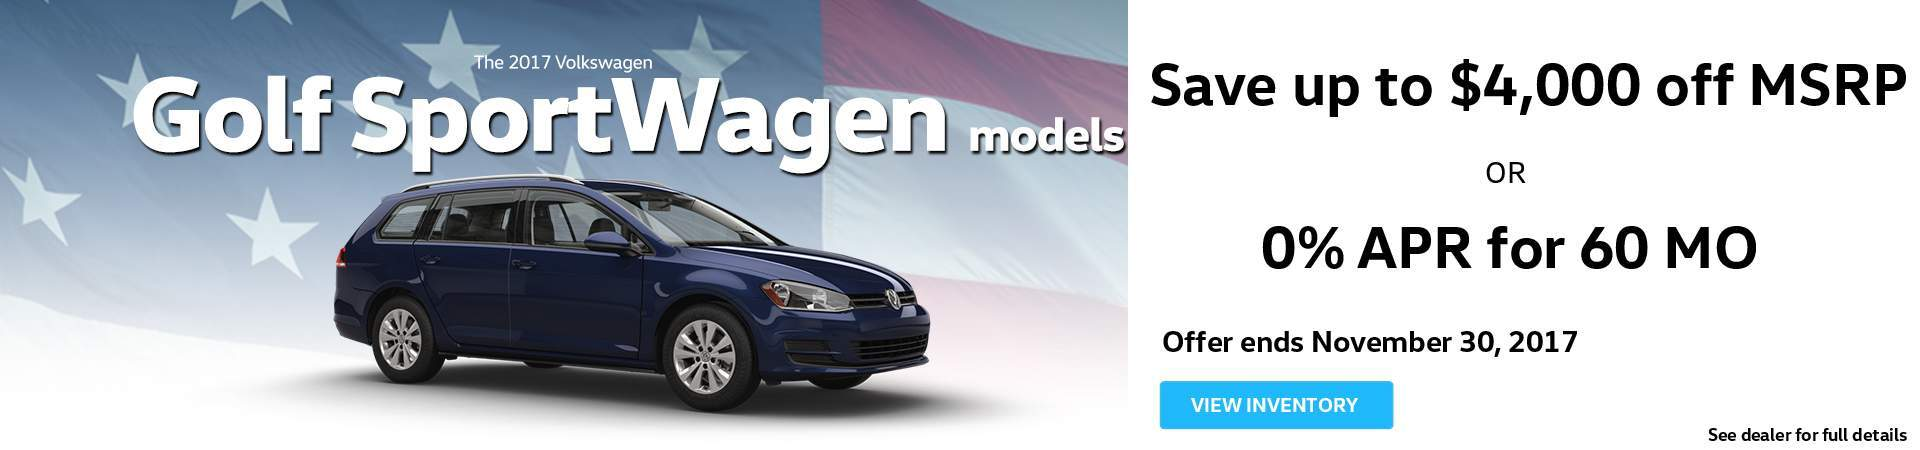 Volkswagen Dealership Stratford CT Used Cars Curran Volkswagen